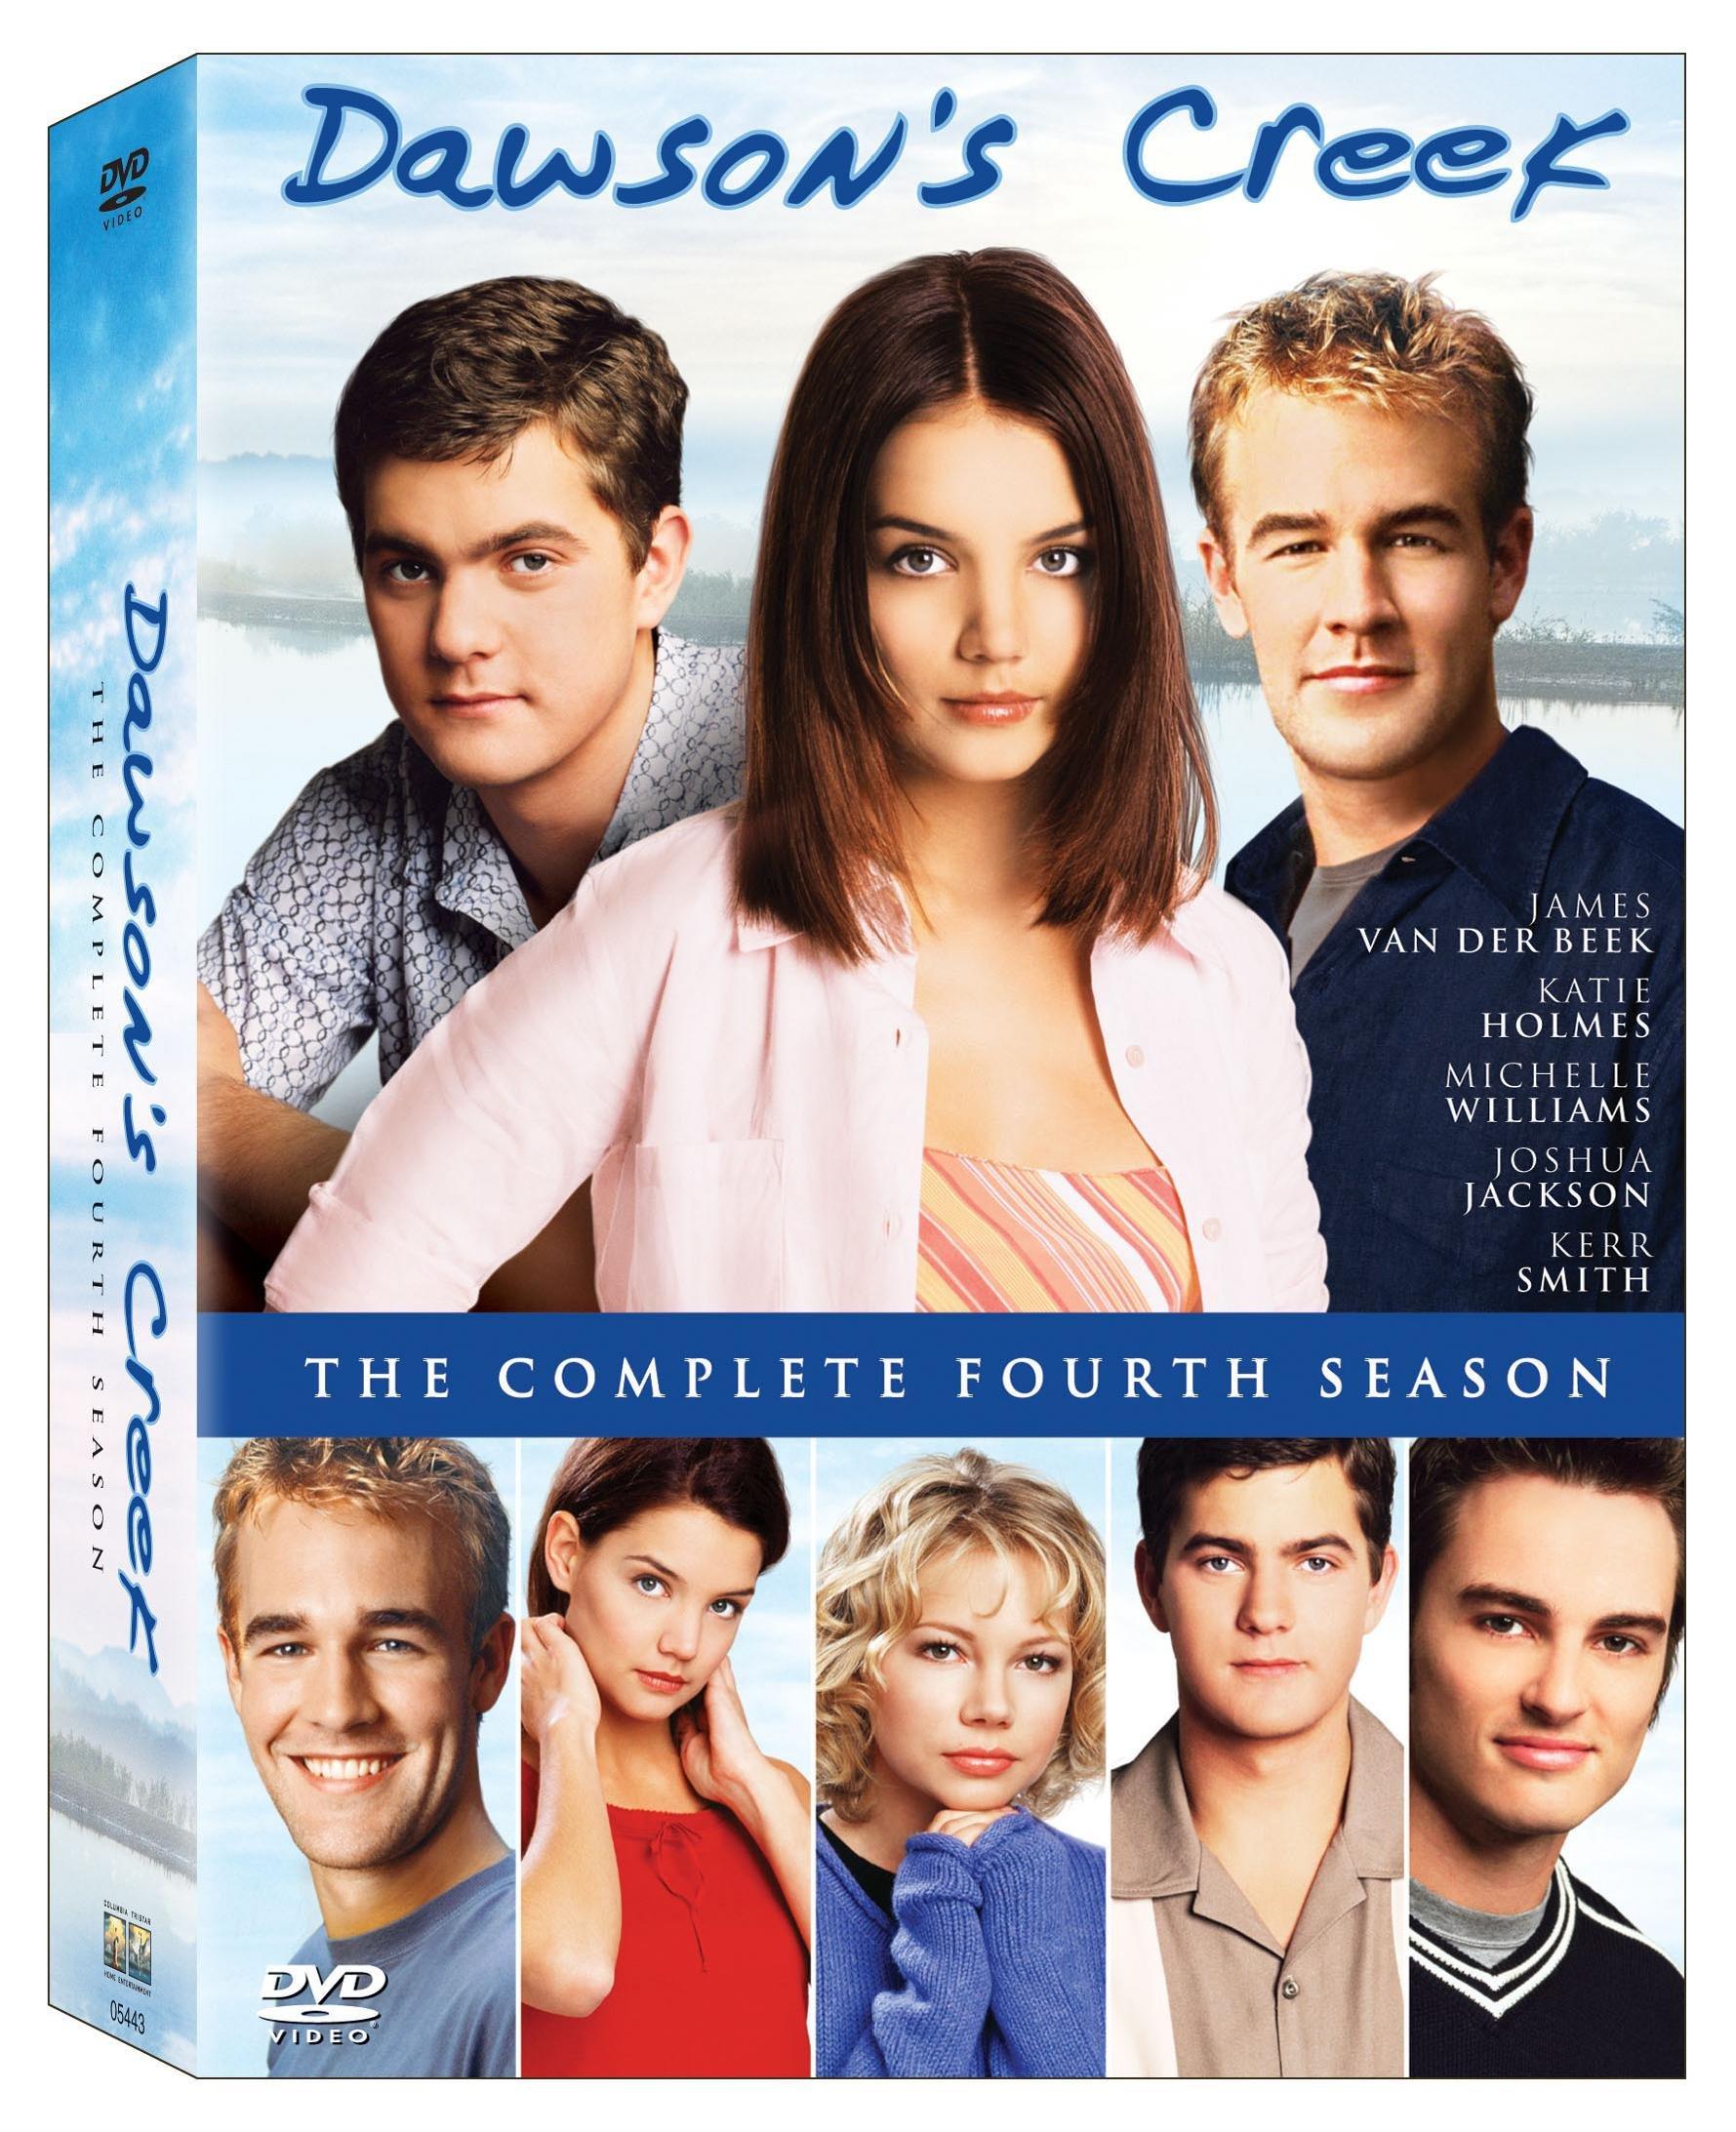 Dawson's Creek: The Complete Fourth Season (DVD)